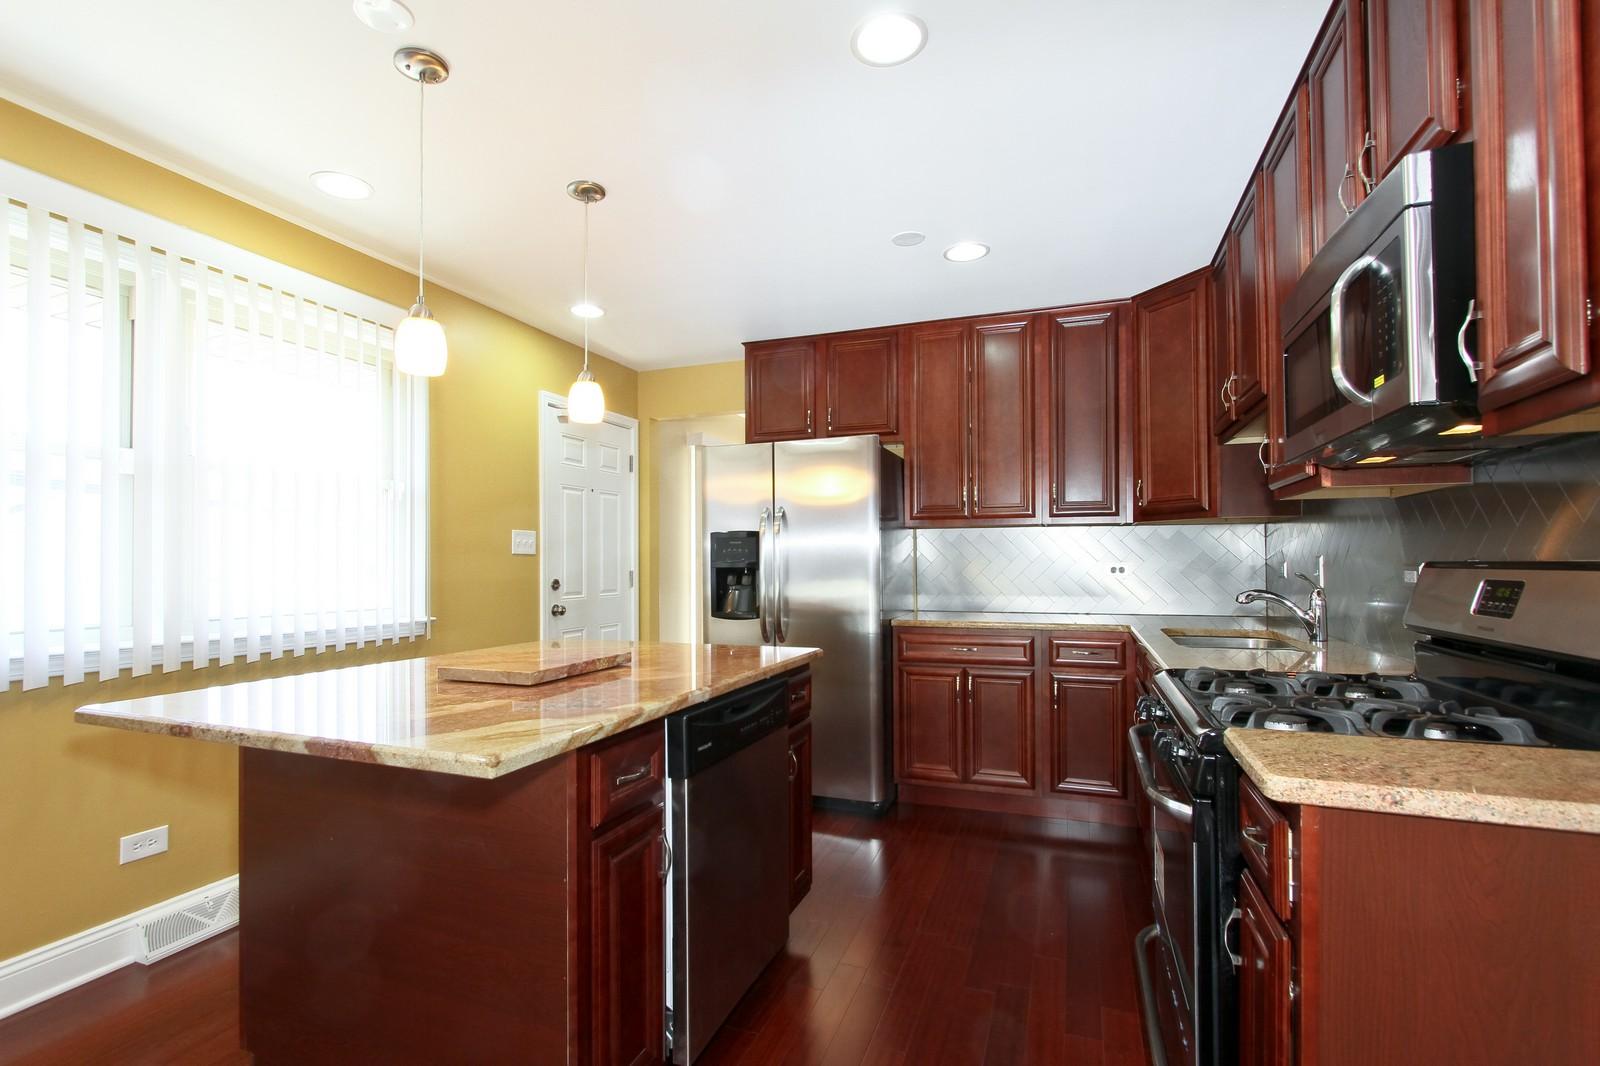 Real Estate Photography - 15435 Sunset, Dolton, IL, 60419 - Kitchen